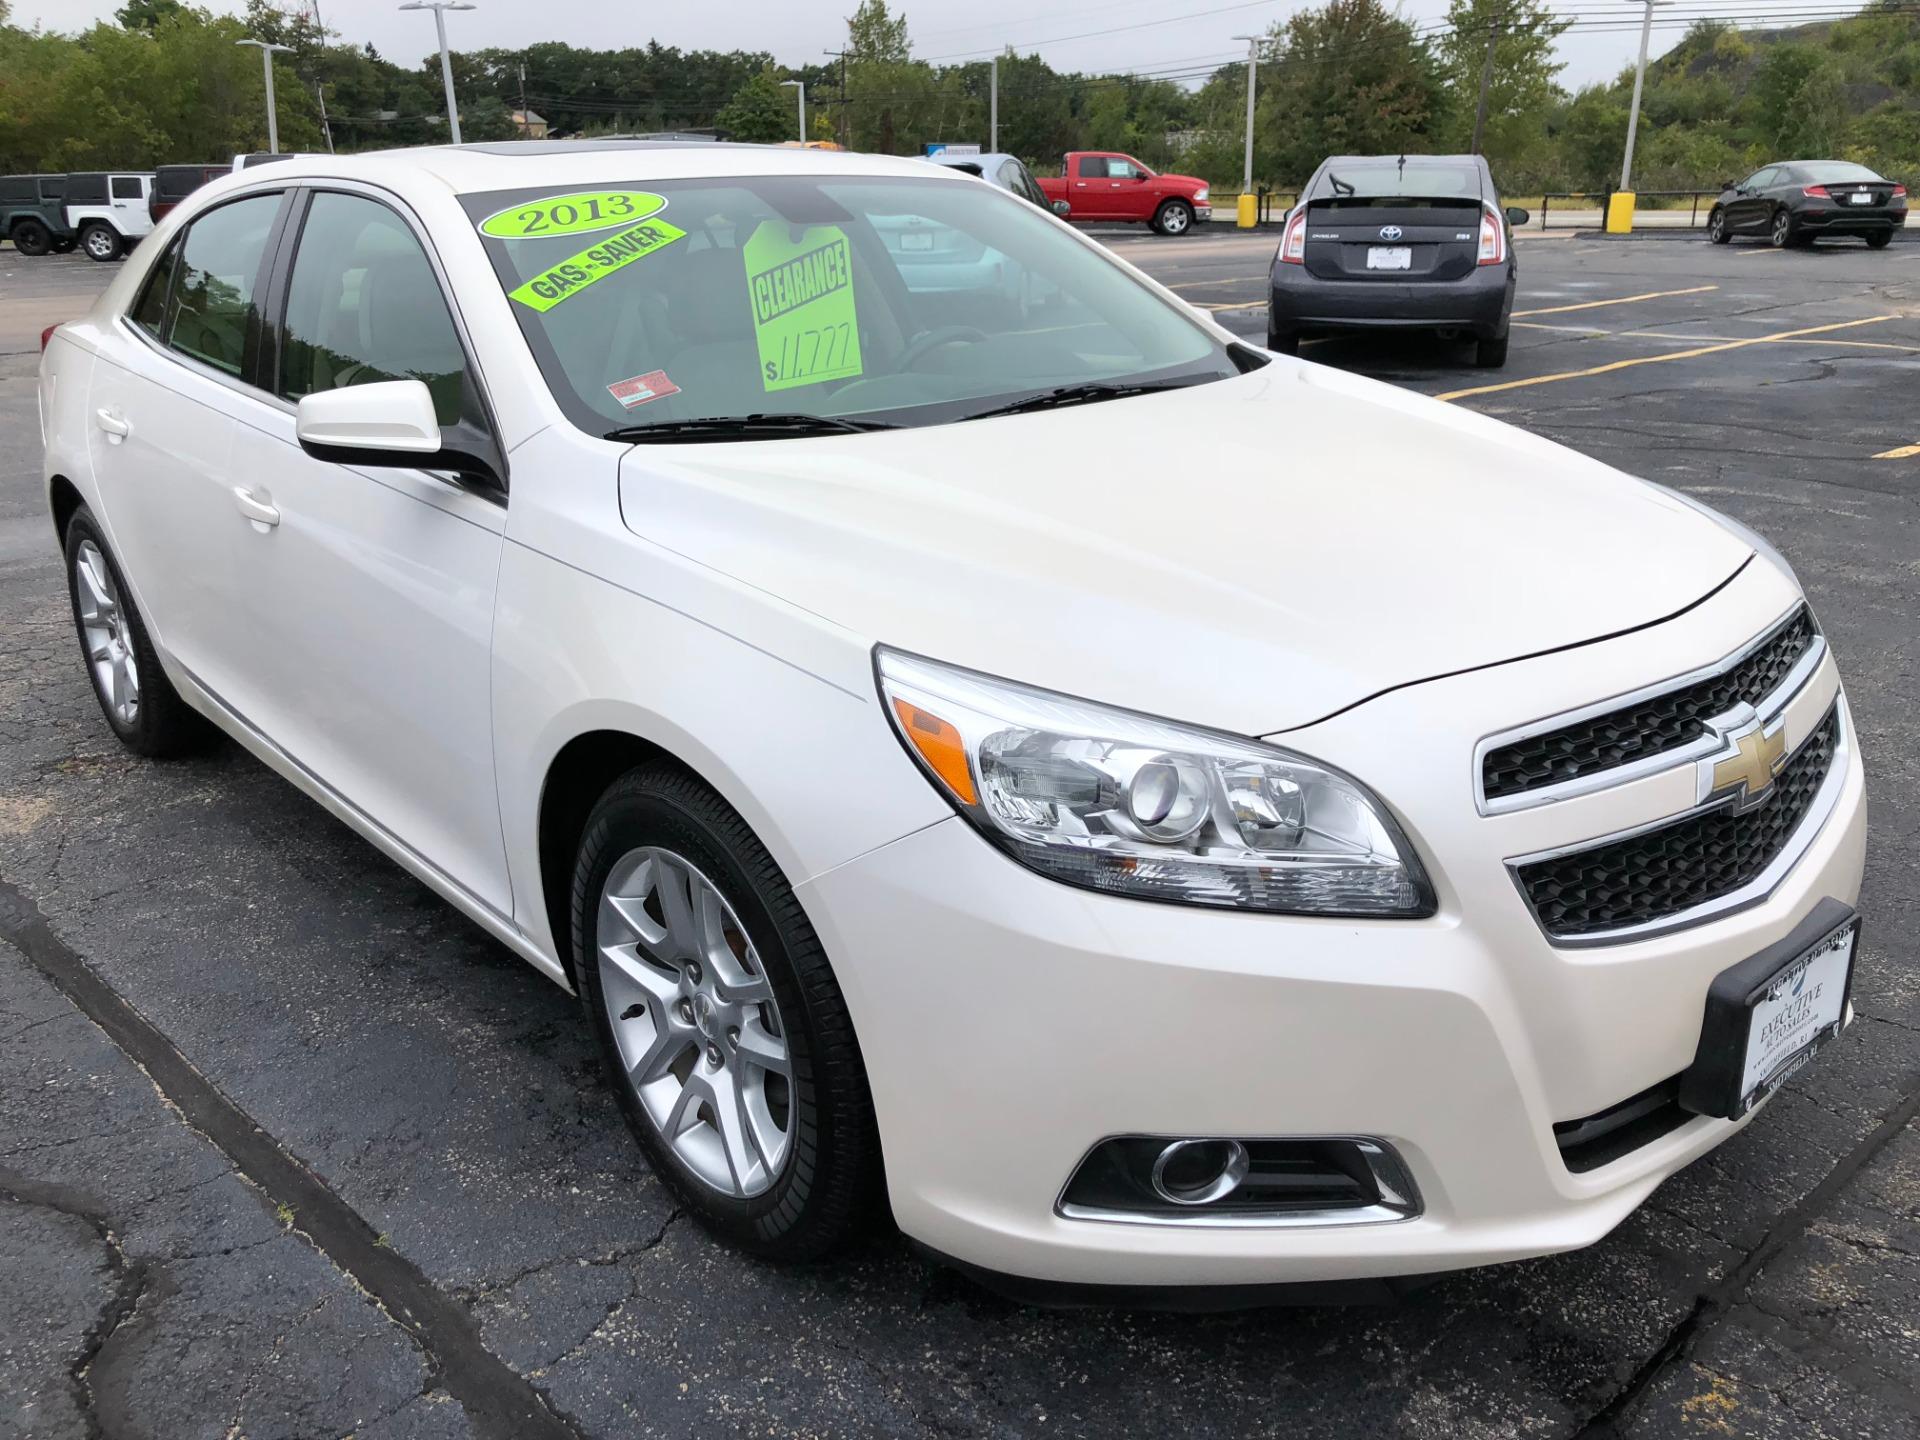 Used 2013 Chevrolet Malibu 2lt 2lt For Sale 10 799